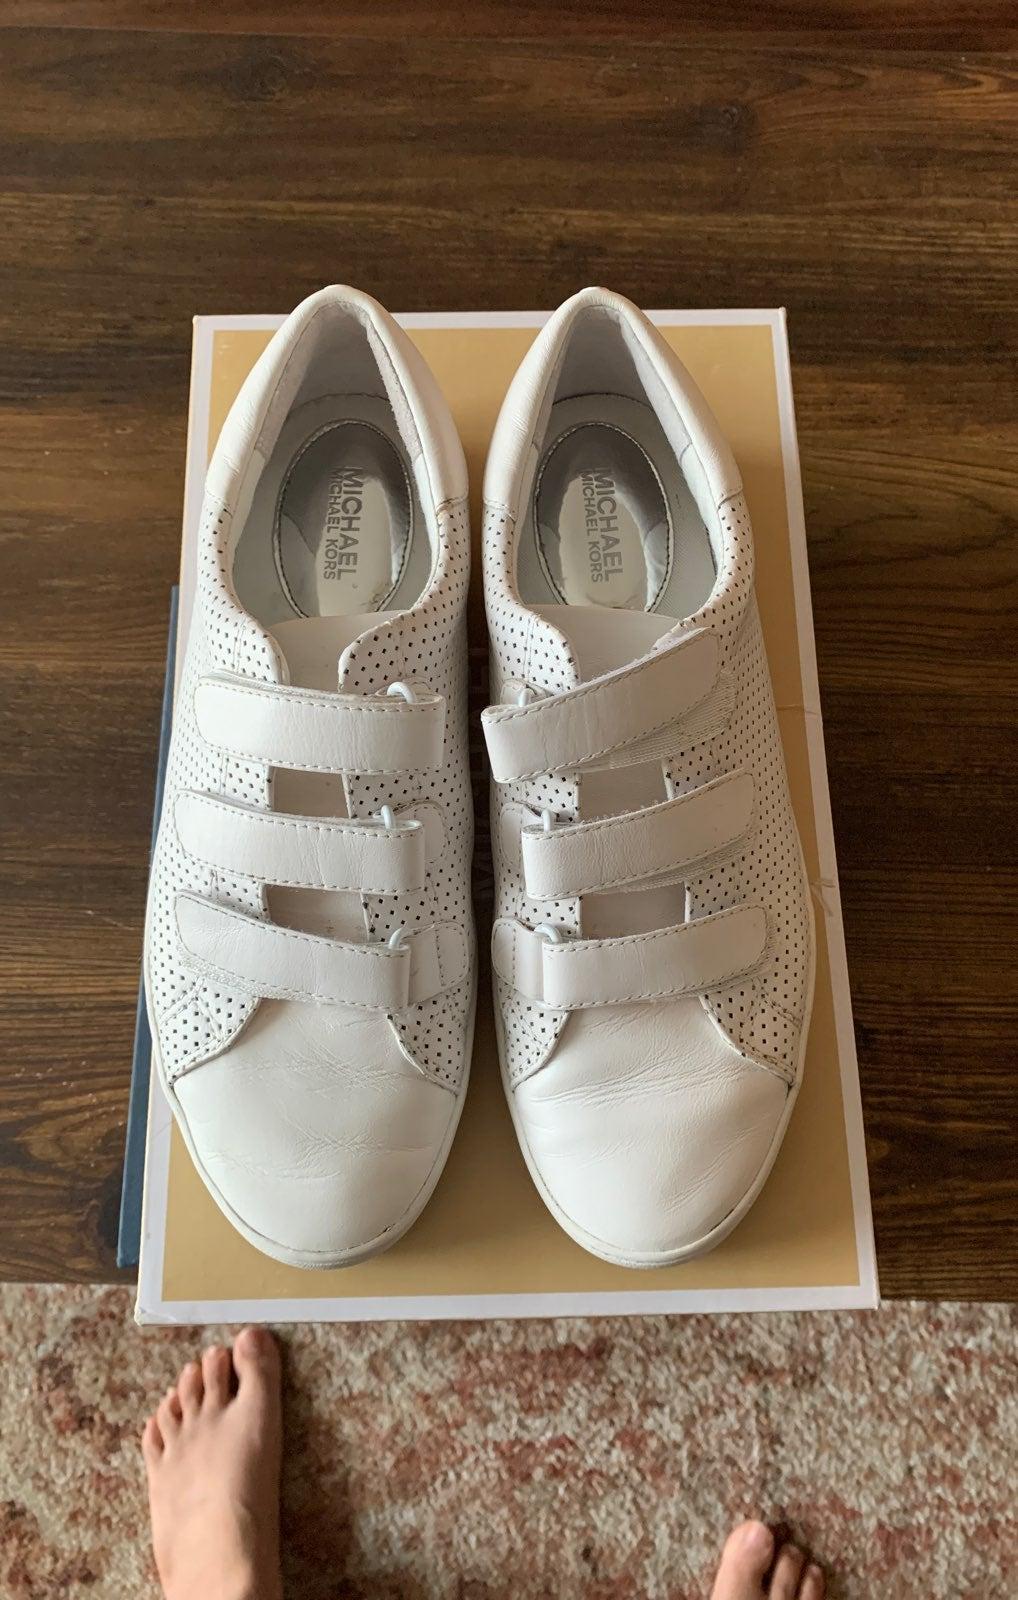 Michael Kors Sneakers white 7.5